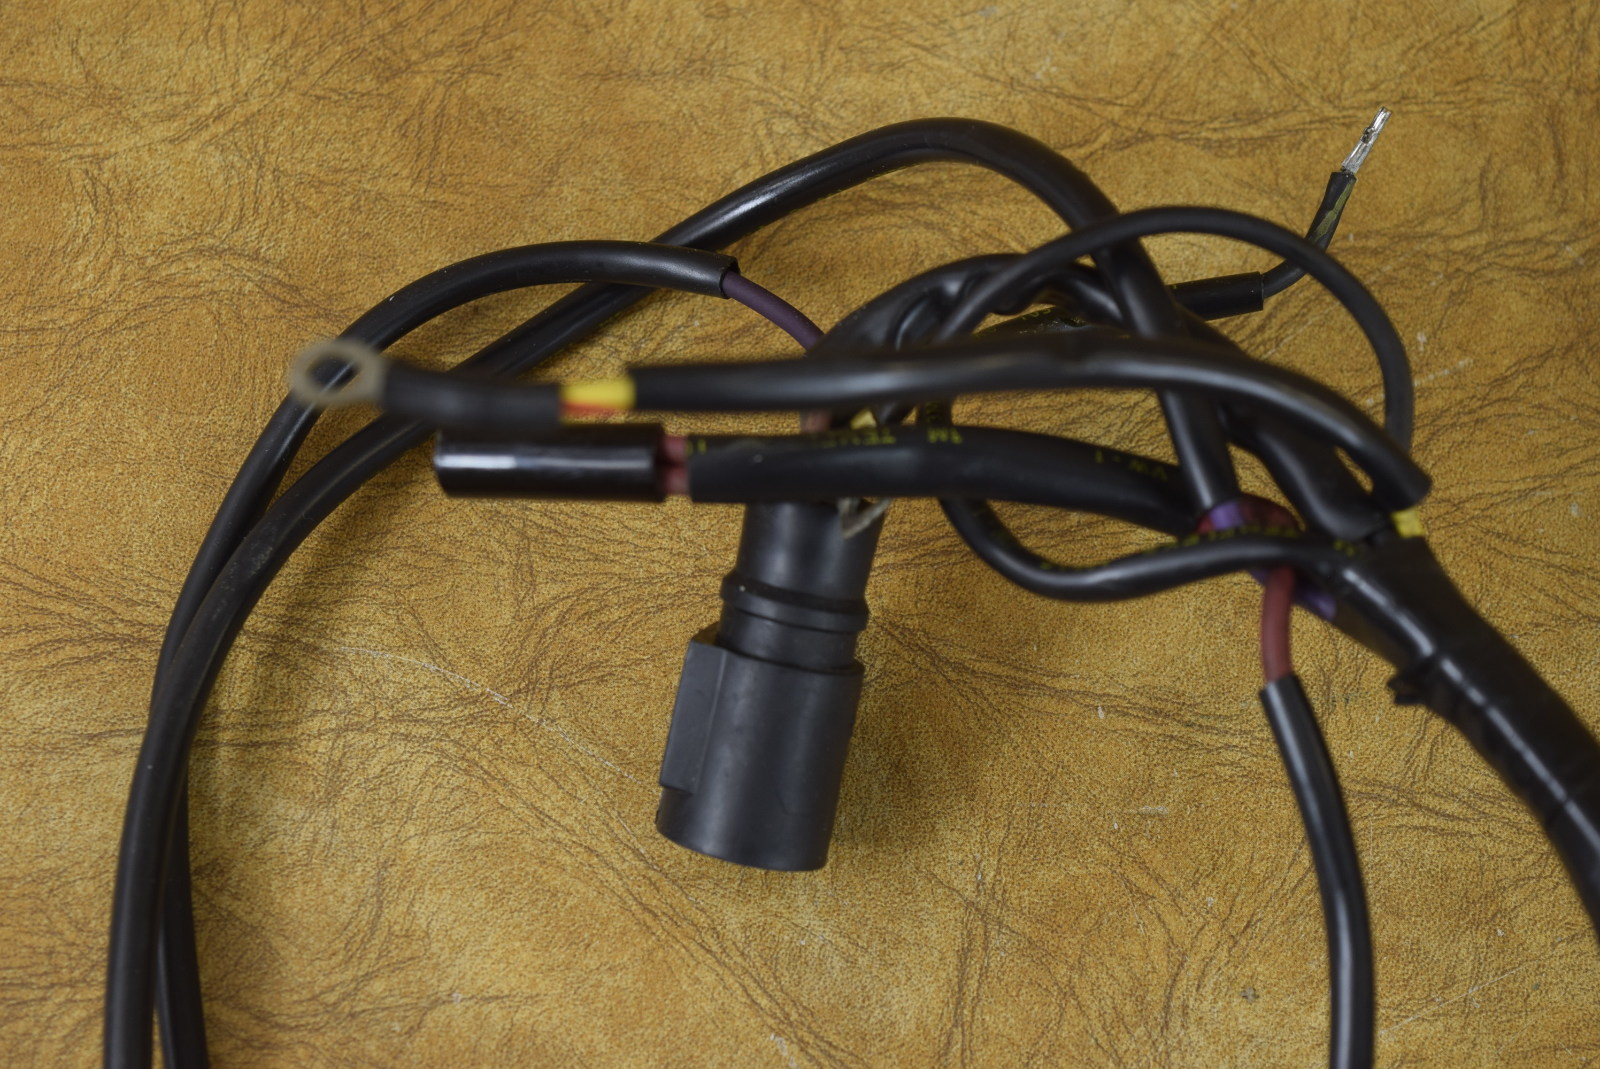 johnson evinrude motor cable wiring harness 583036 1986. Black Bedroom Furniture Sets. Home Design Ideas